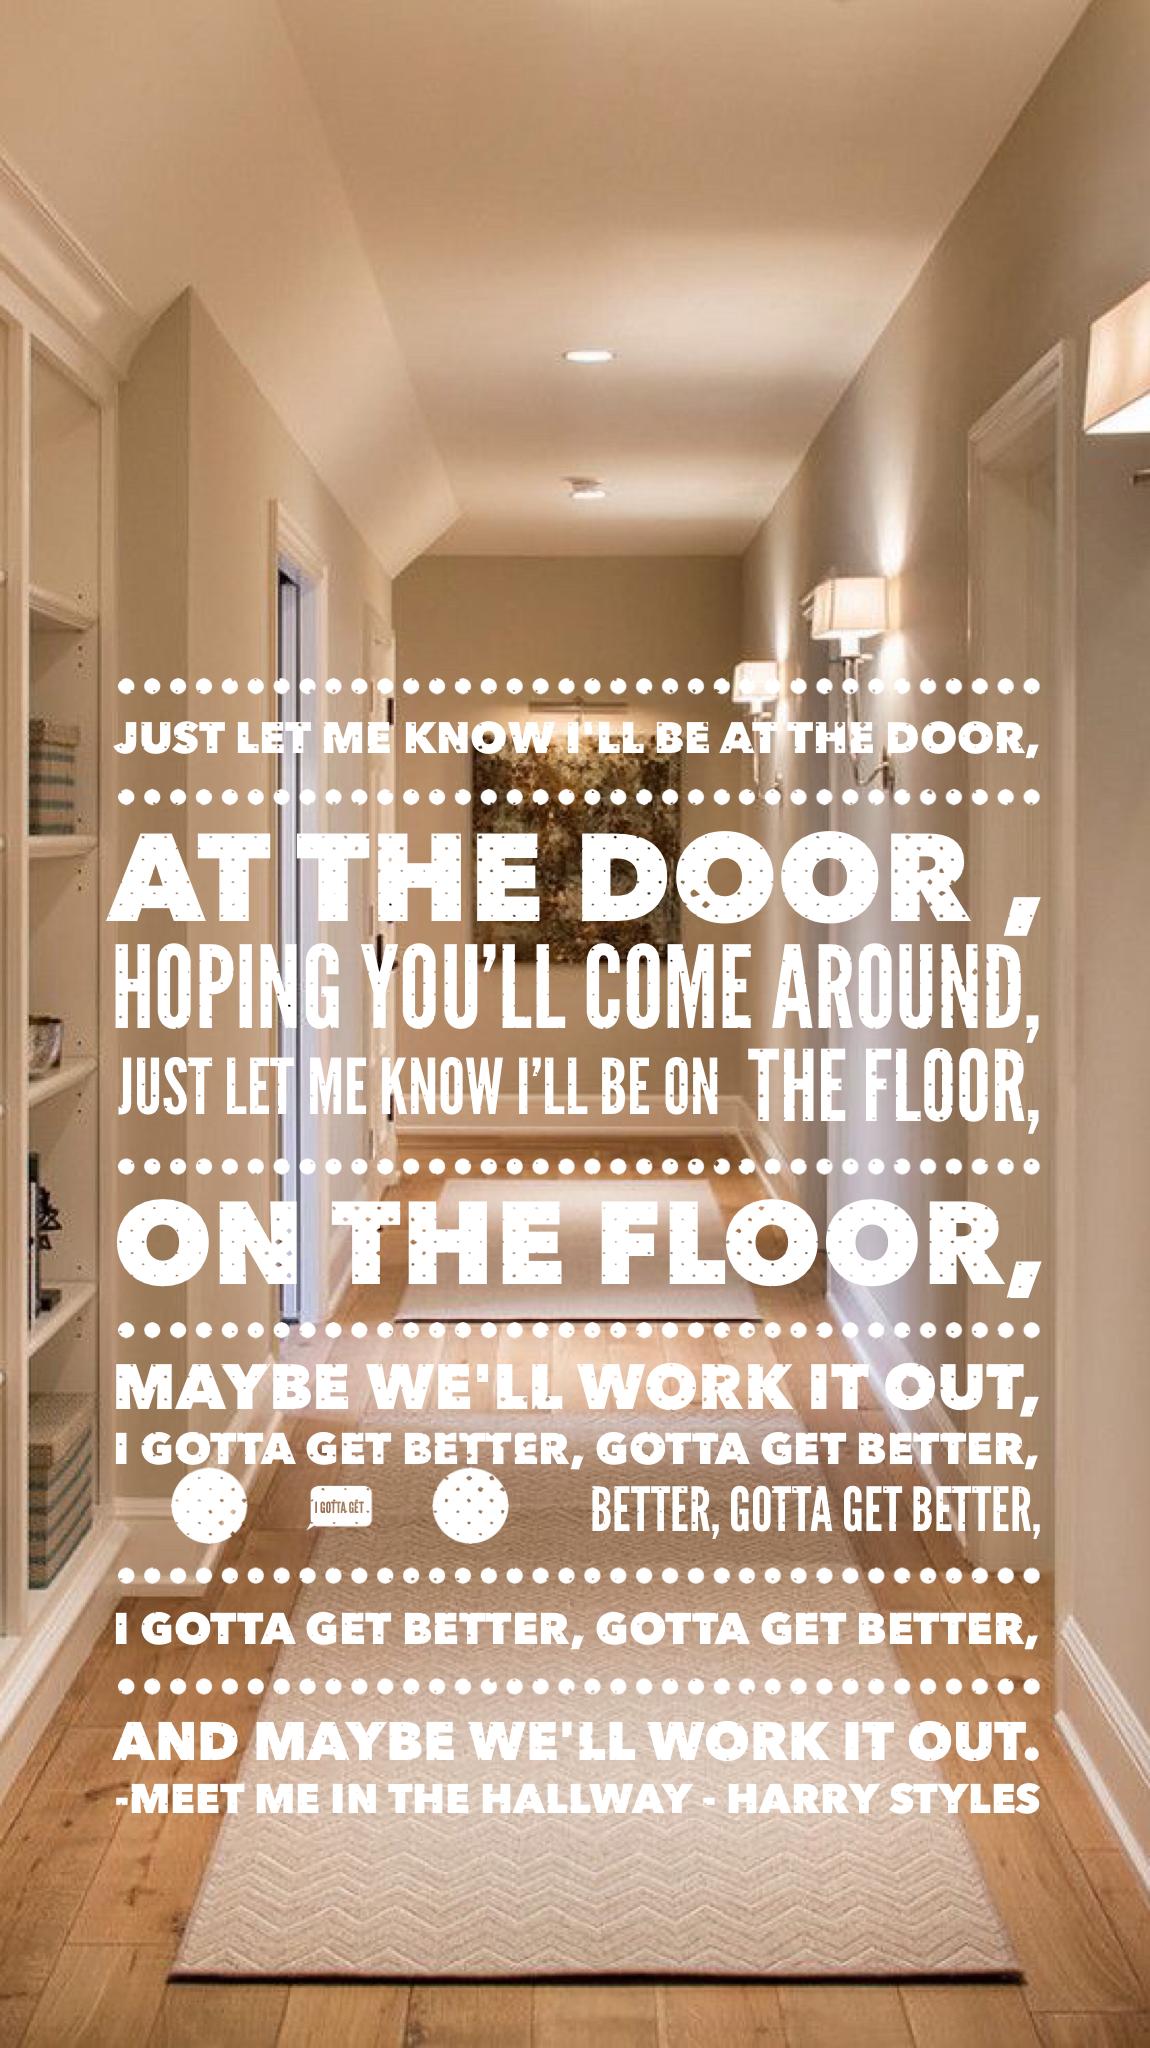 Meet Me In The Hallway Iphone Lyrics Wallpaper For Life Pinterest